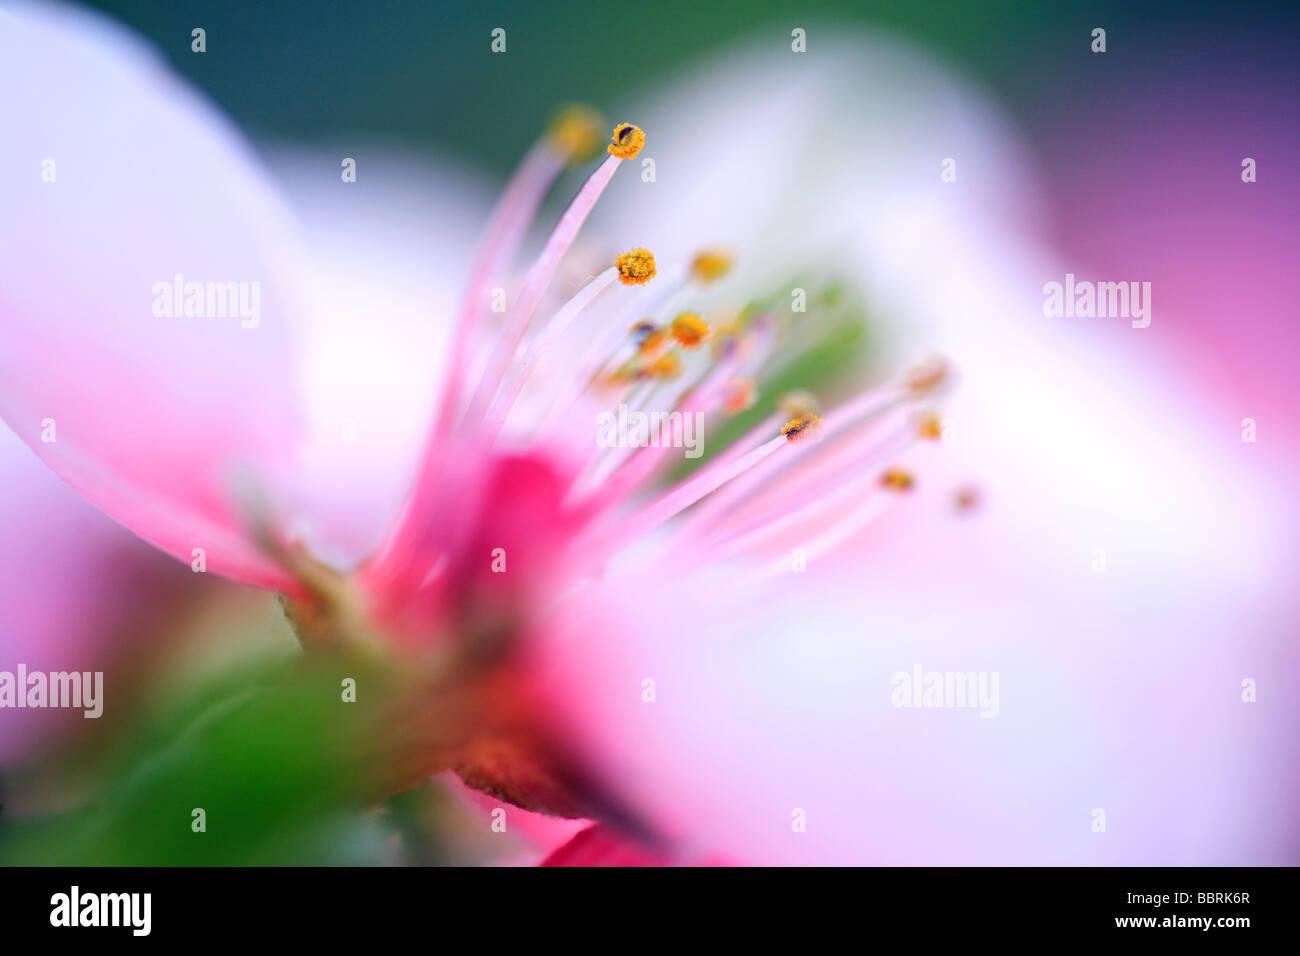 Peach Bonanza Prunus persica Bonanaza flower England Spring - Stock Image